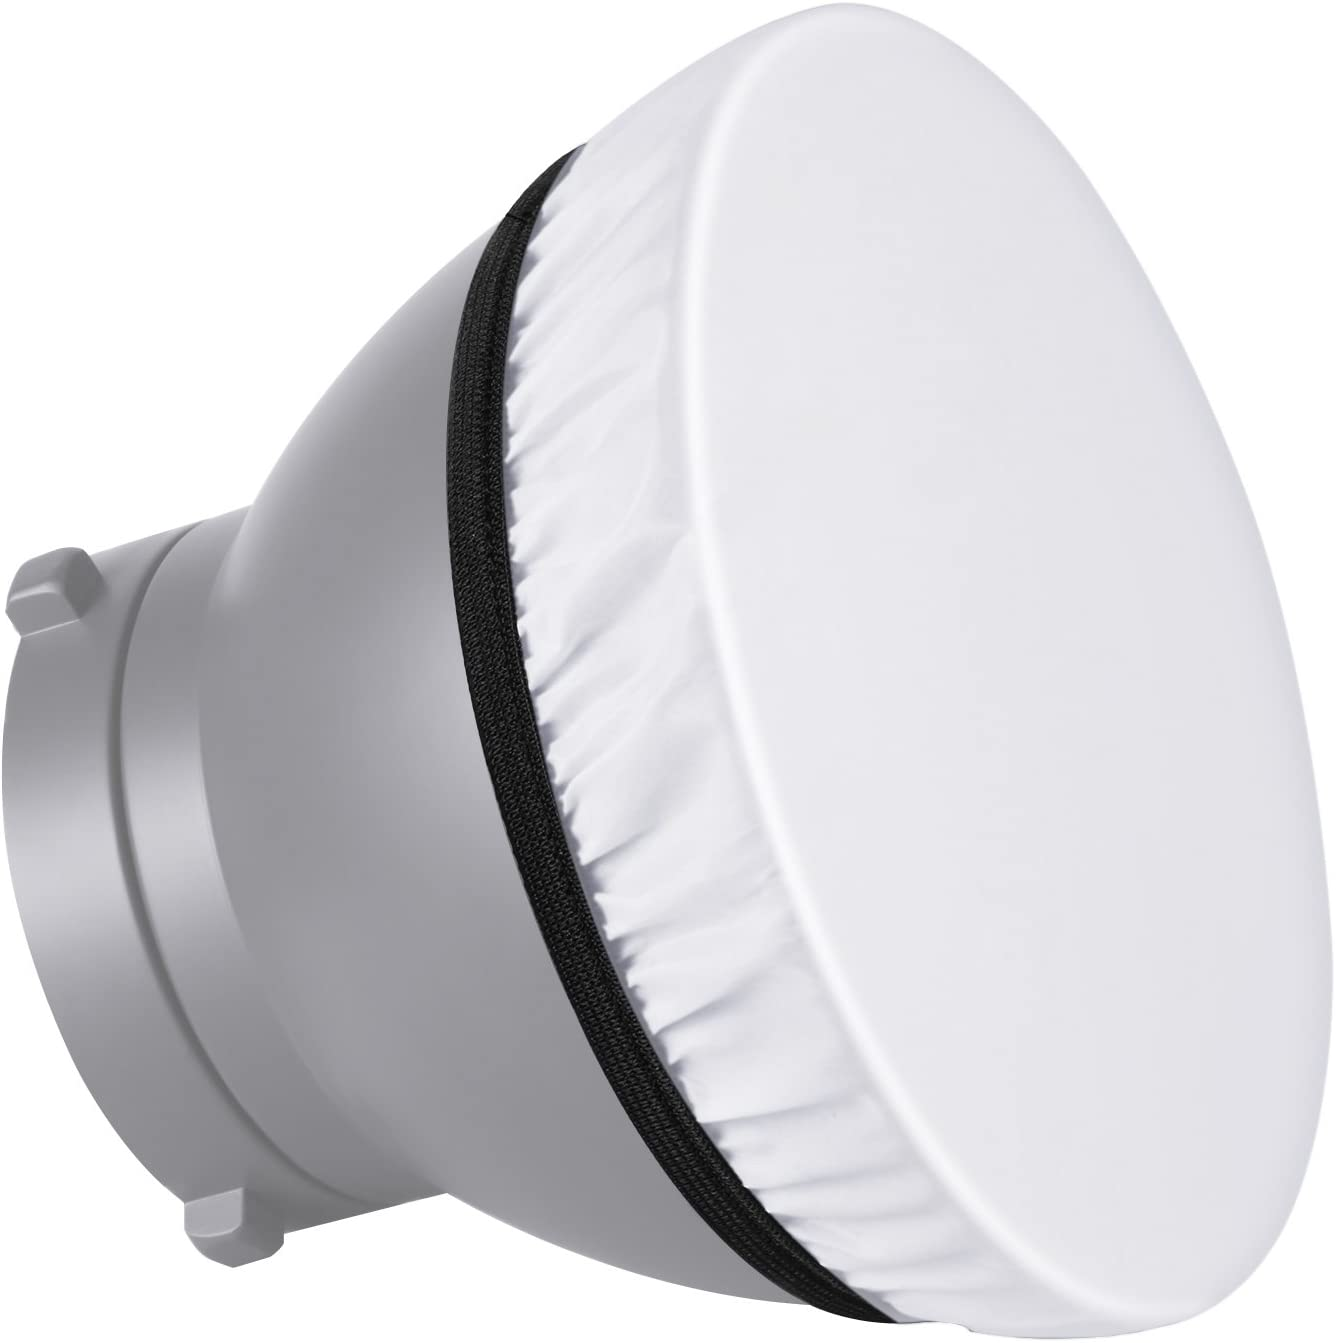 Fotoconic 7 to 11 Soft White Diffuser Sock for Standard Reflector//Sparkler Reflectors 2-Pack